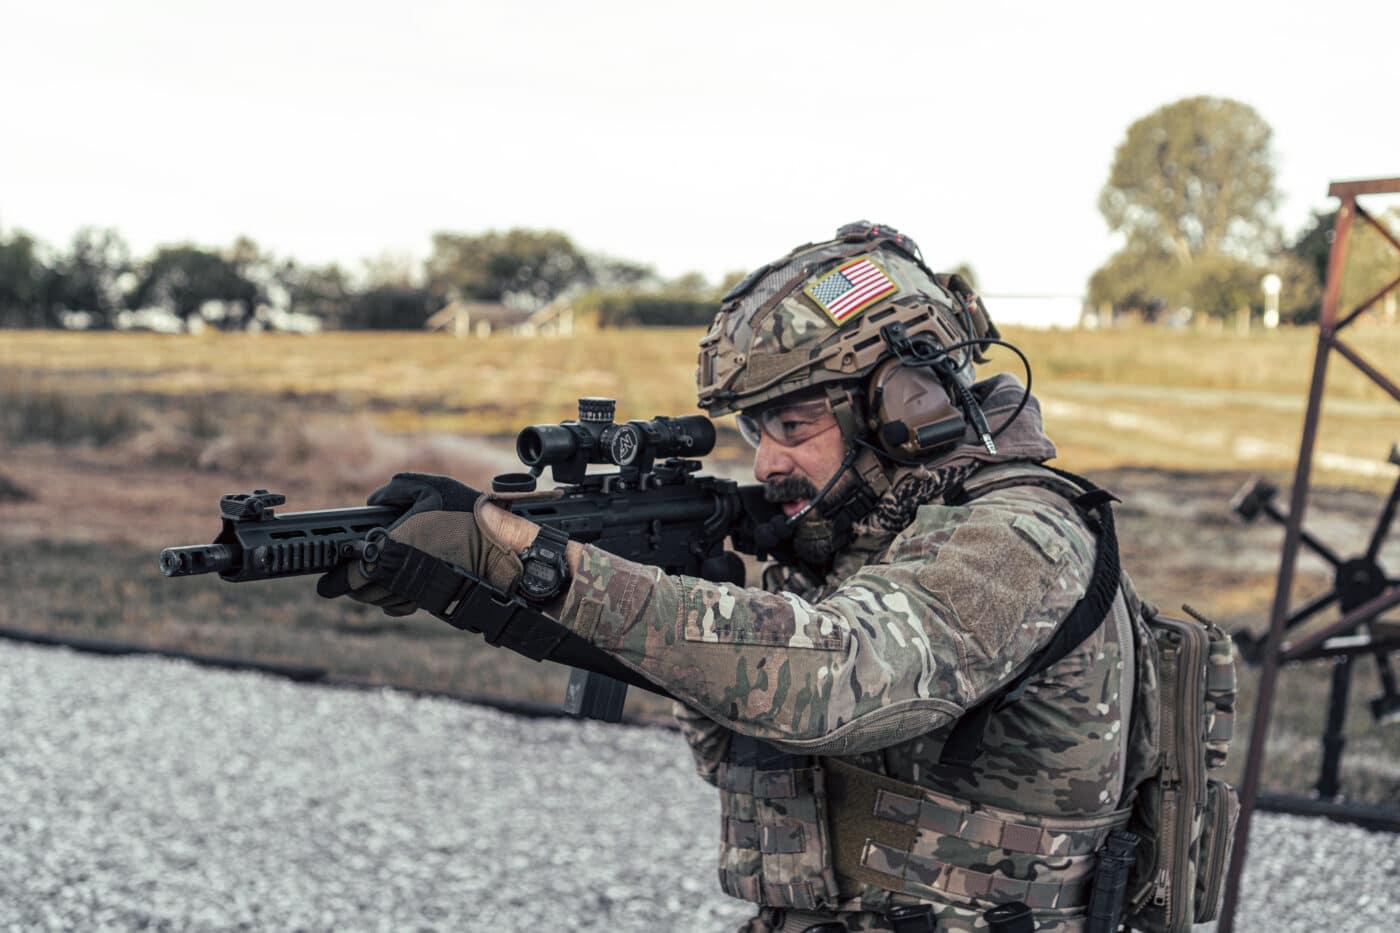 Solider using rifle with Nightforce NX8 1-8x scope